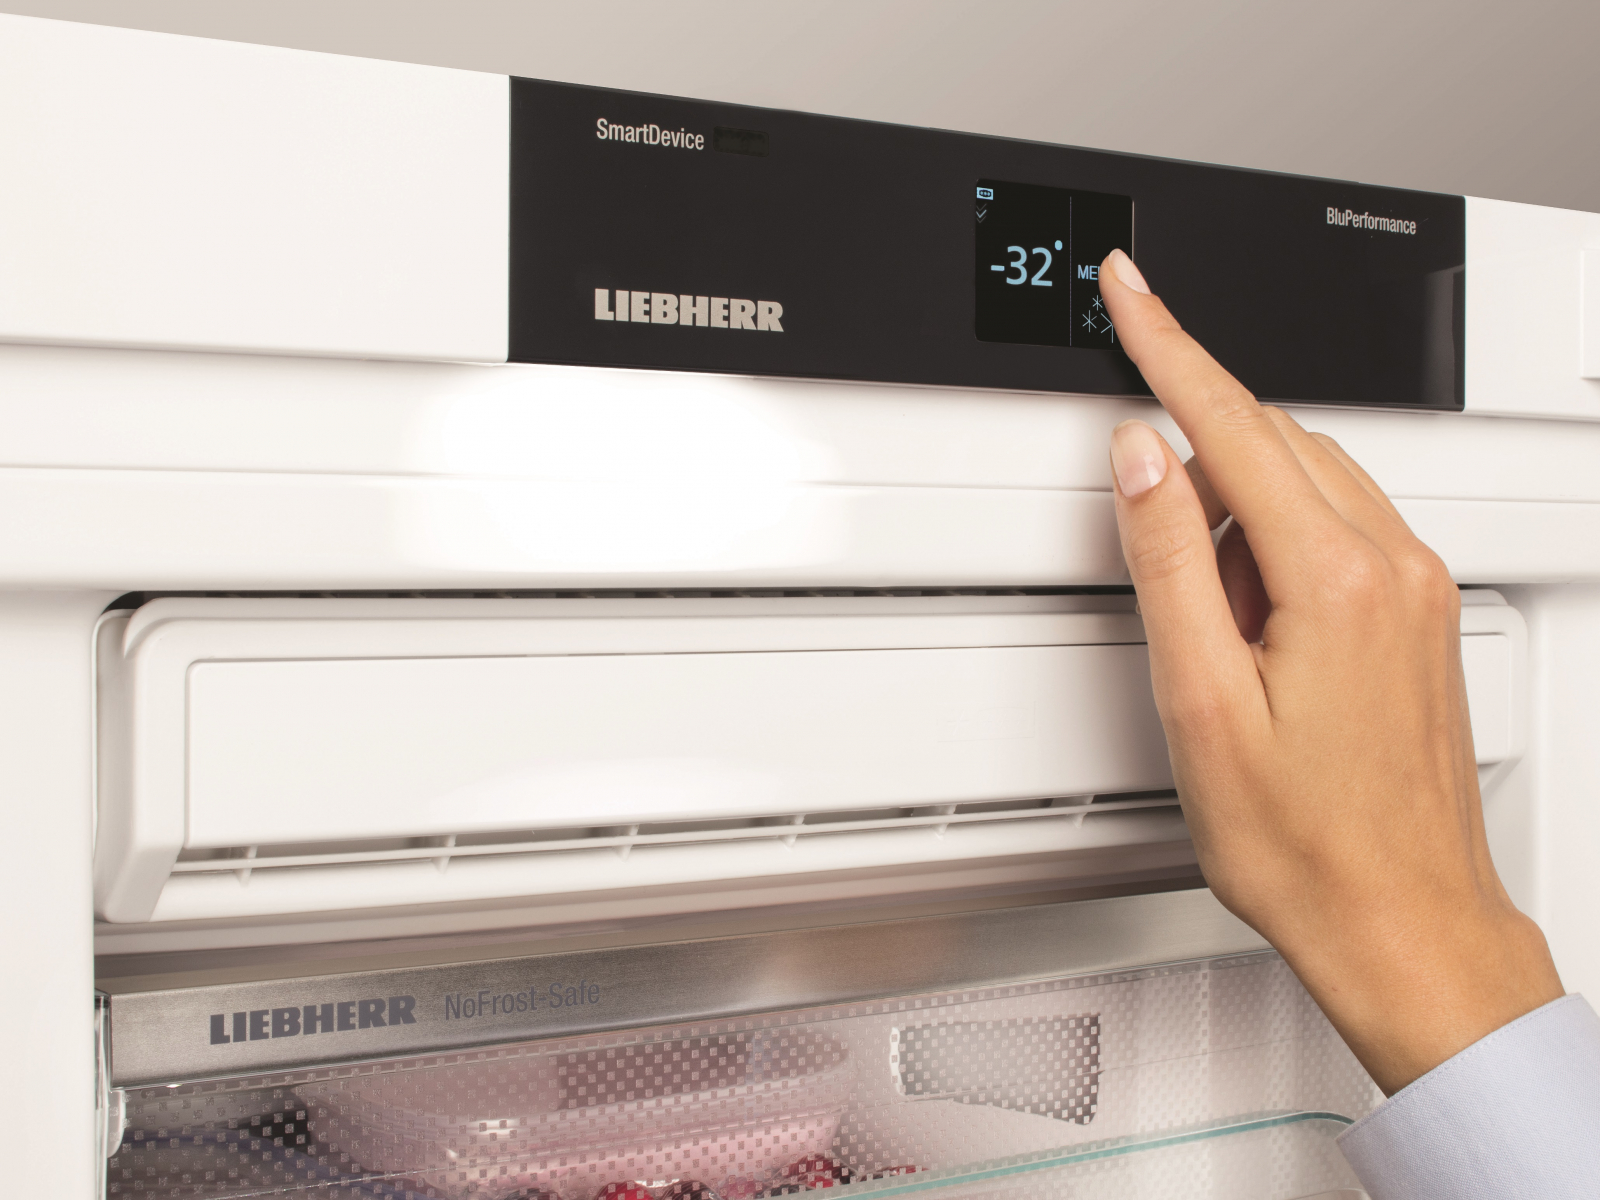 купить Side-by-Side холодильник Liebherr SBSbs 8673 Украина фото 17